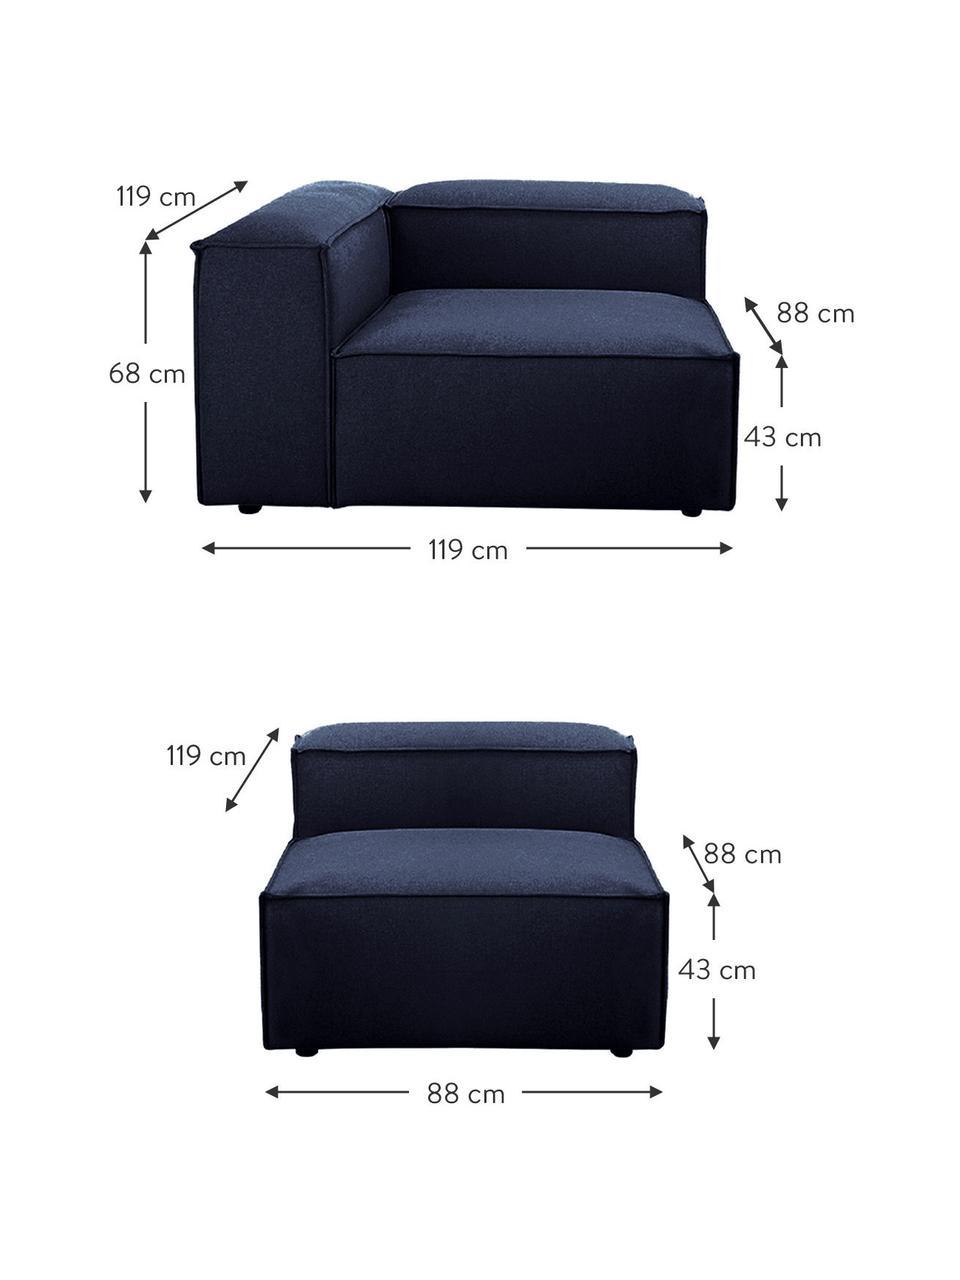 Modulares Sofa Lennon (4-Sitzer) in Blau, Bezug: 100% Polyester Der strapa, Gestell: Massives Kiefernholz, Spe, Füße: Kunststoff Die Füße befin, Webstoff Blau, B 327 x T 119 cm